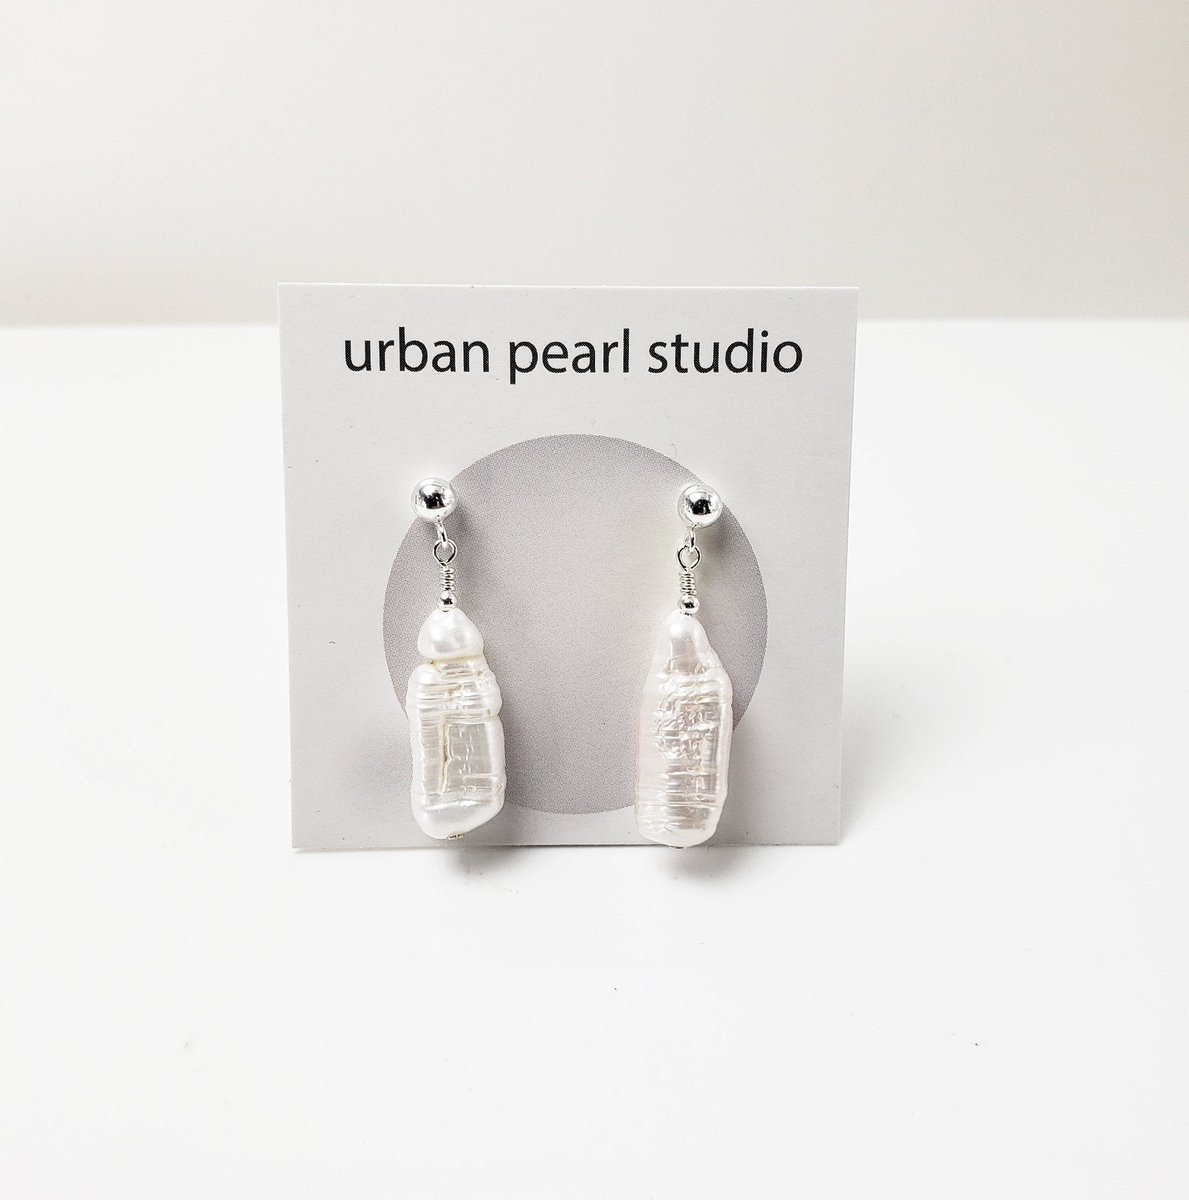 Biwa Pearl Earrings Stick Pearl Drop Earrings Sterling Silver Studs BPE226  #giftsforher #lovejewelry #pearlnecklace #etsy #handmadejewelry #handmade